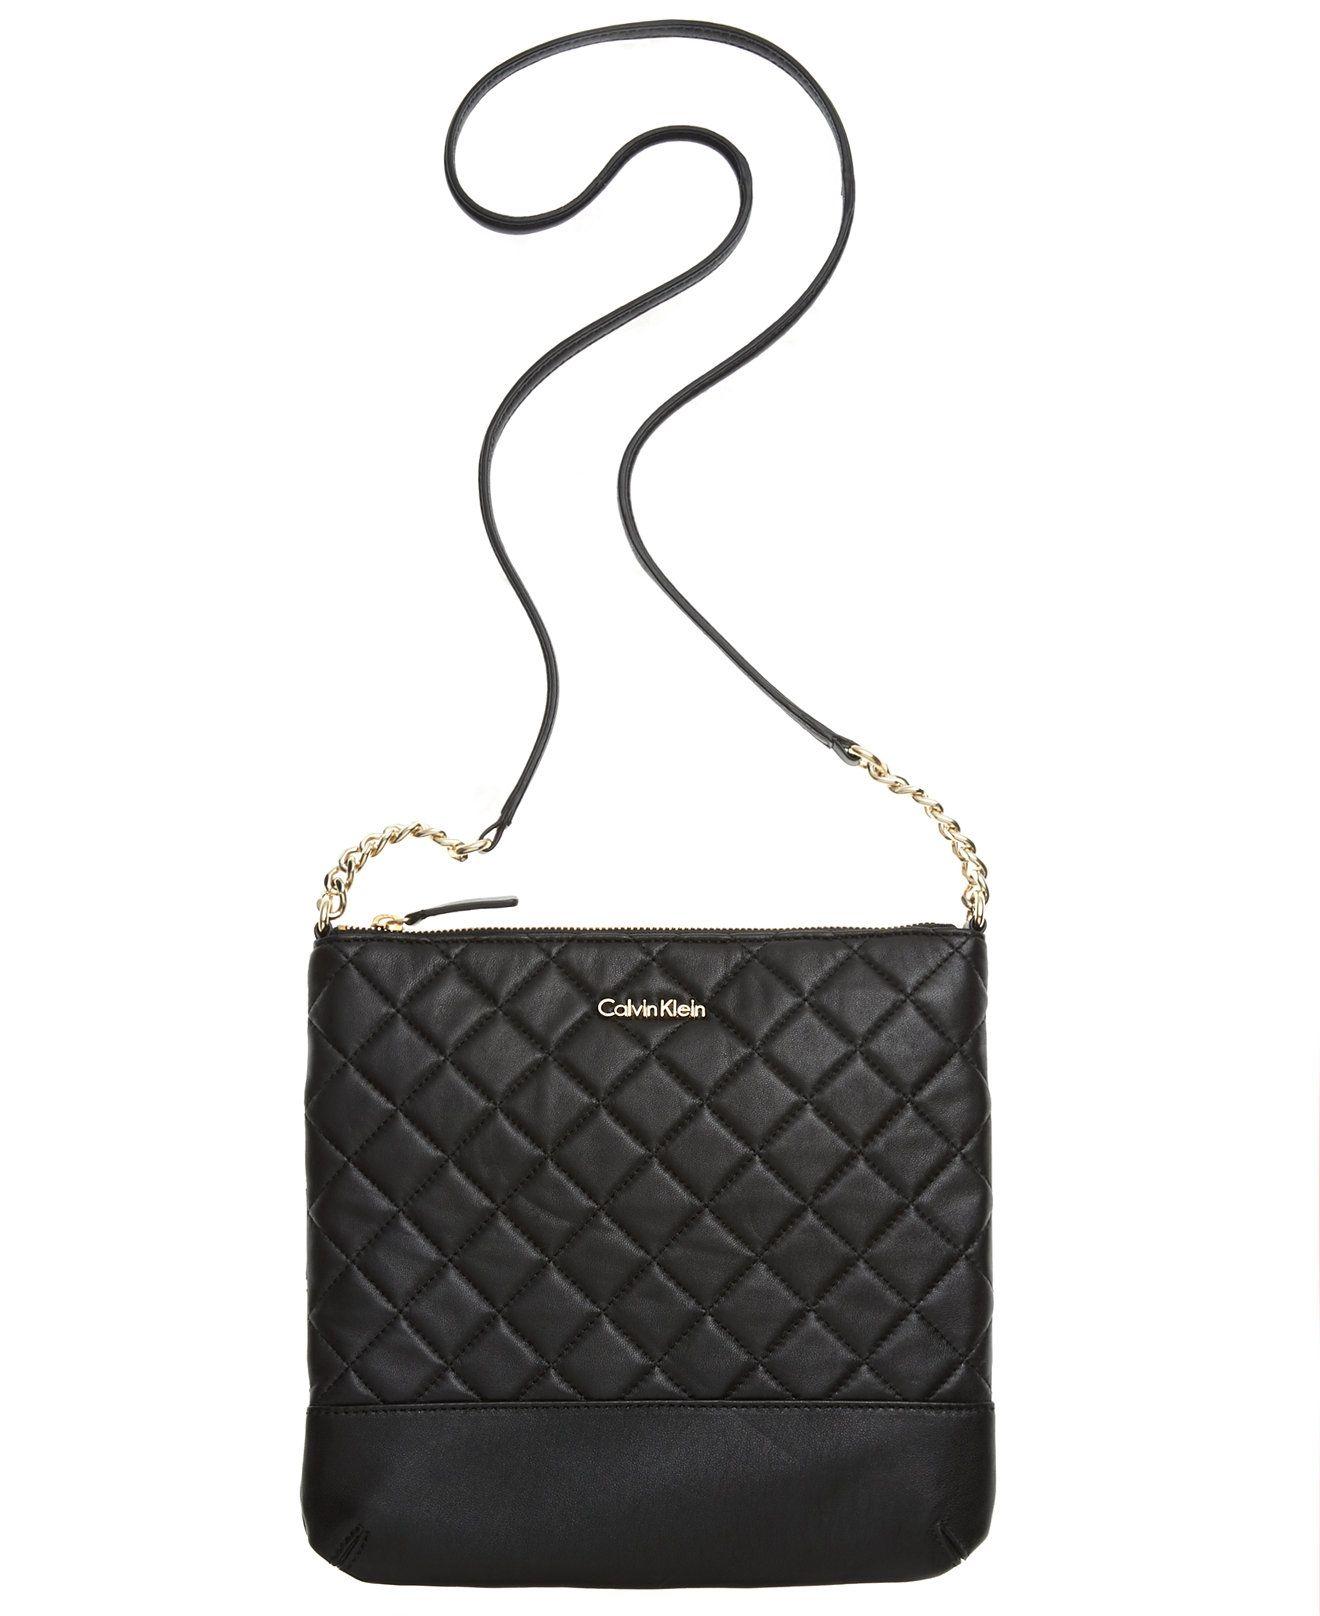 Calvin Klein Sutton Lamb Crossbody - Crossbody & Messenger Bags - Handbags & Accessories - Macy's